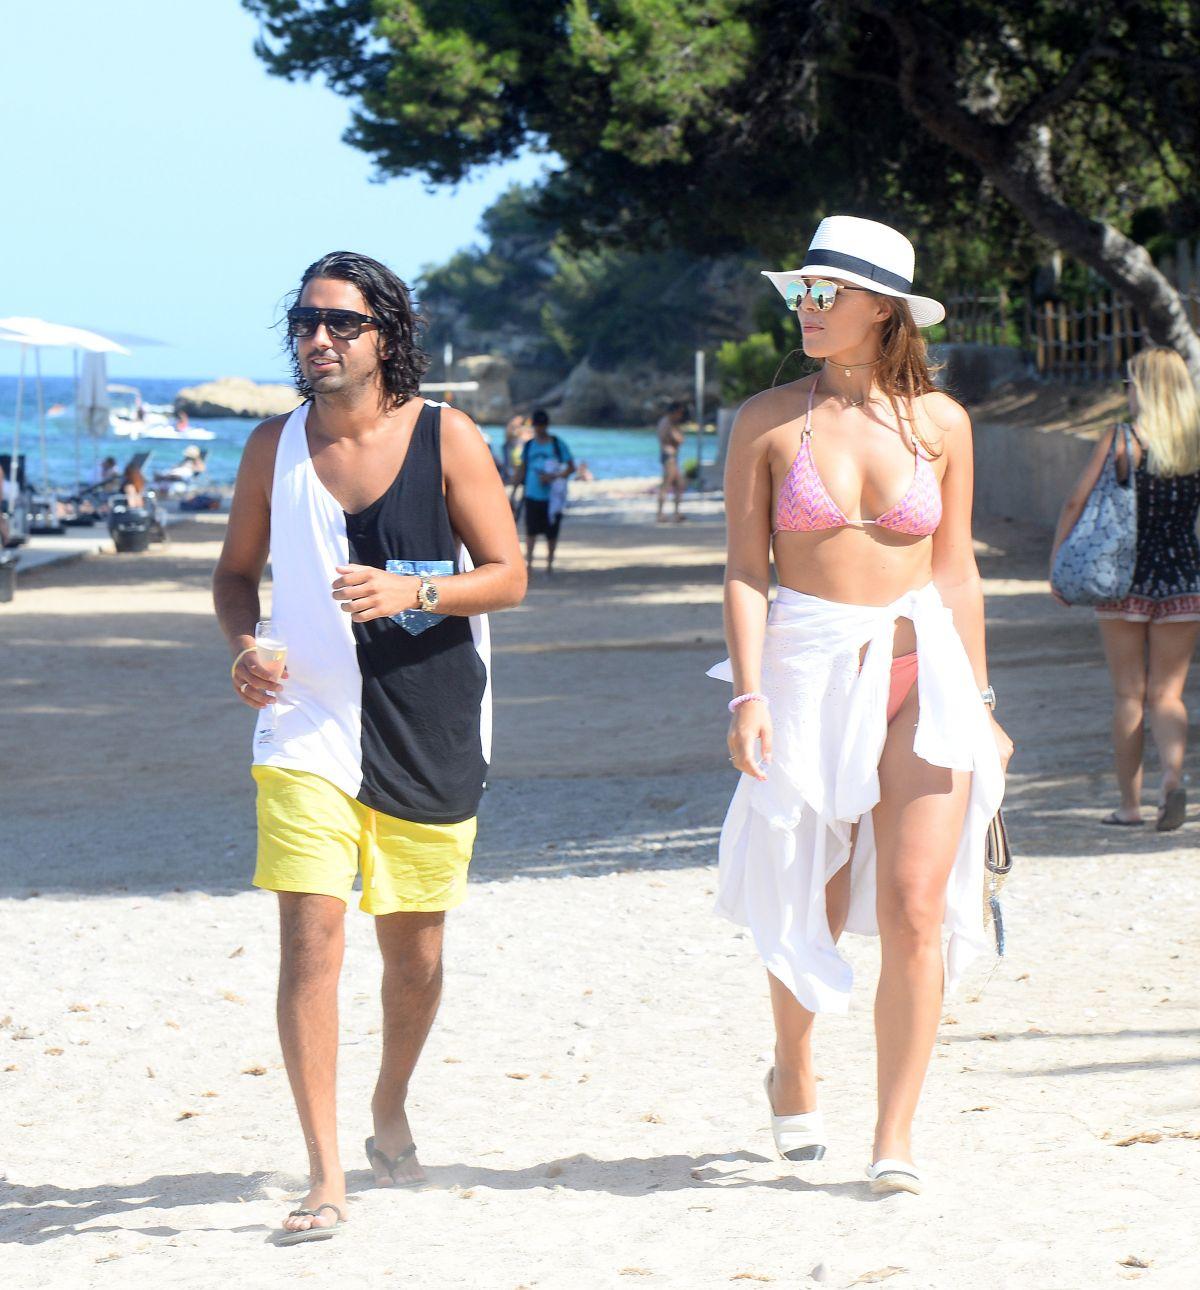 CHLOE LEWIS in Bikini Top on the Beach in Magaluf 07/03/2016